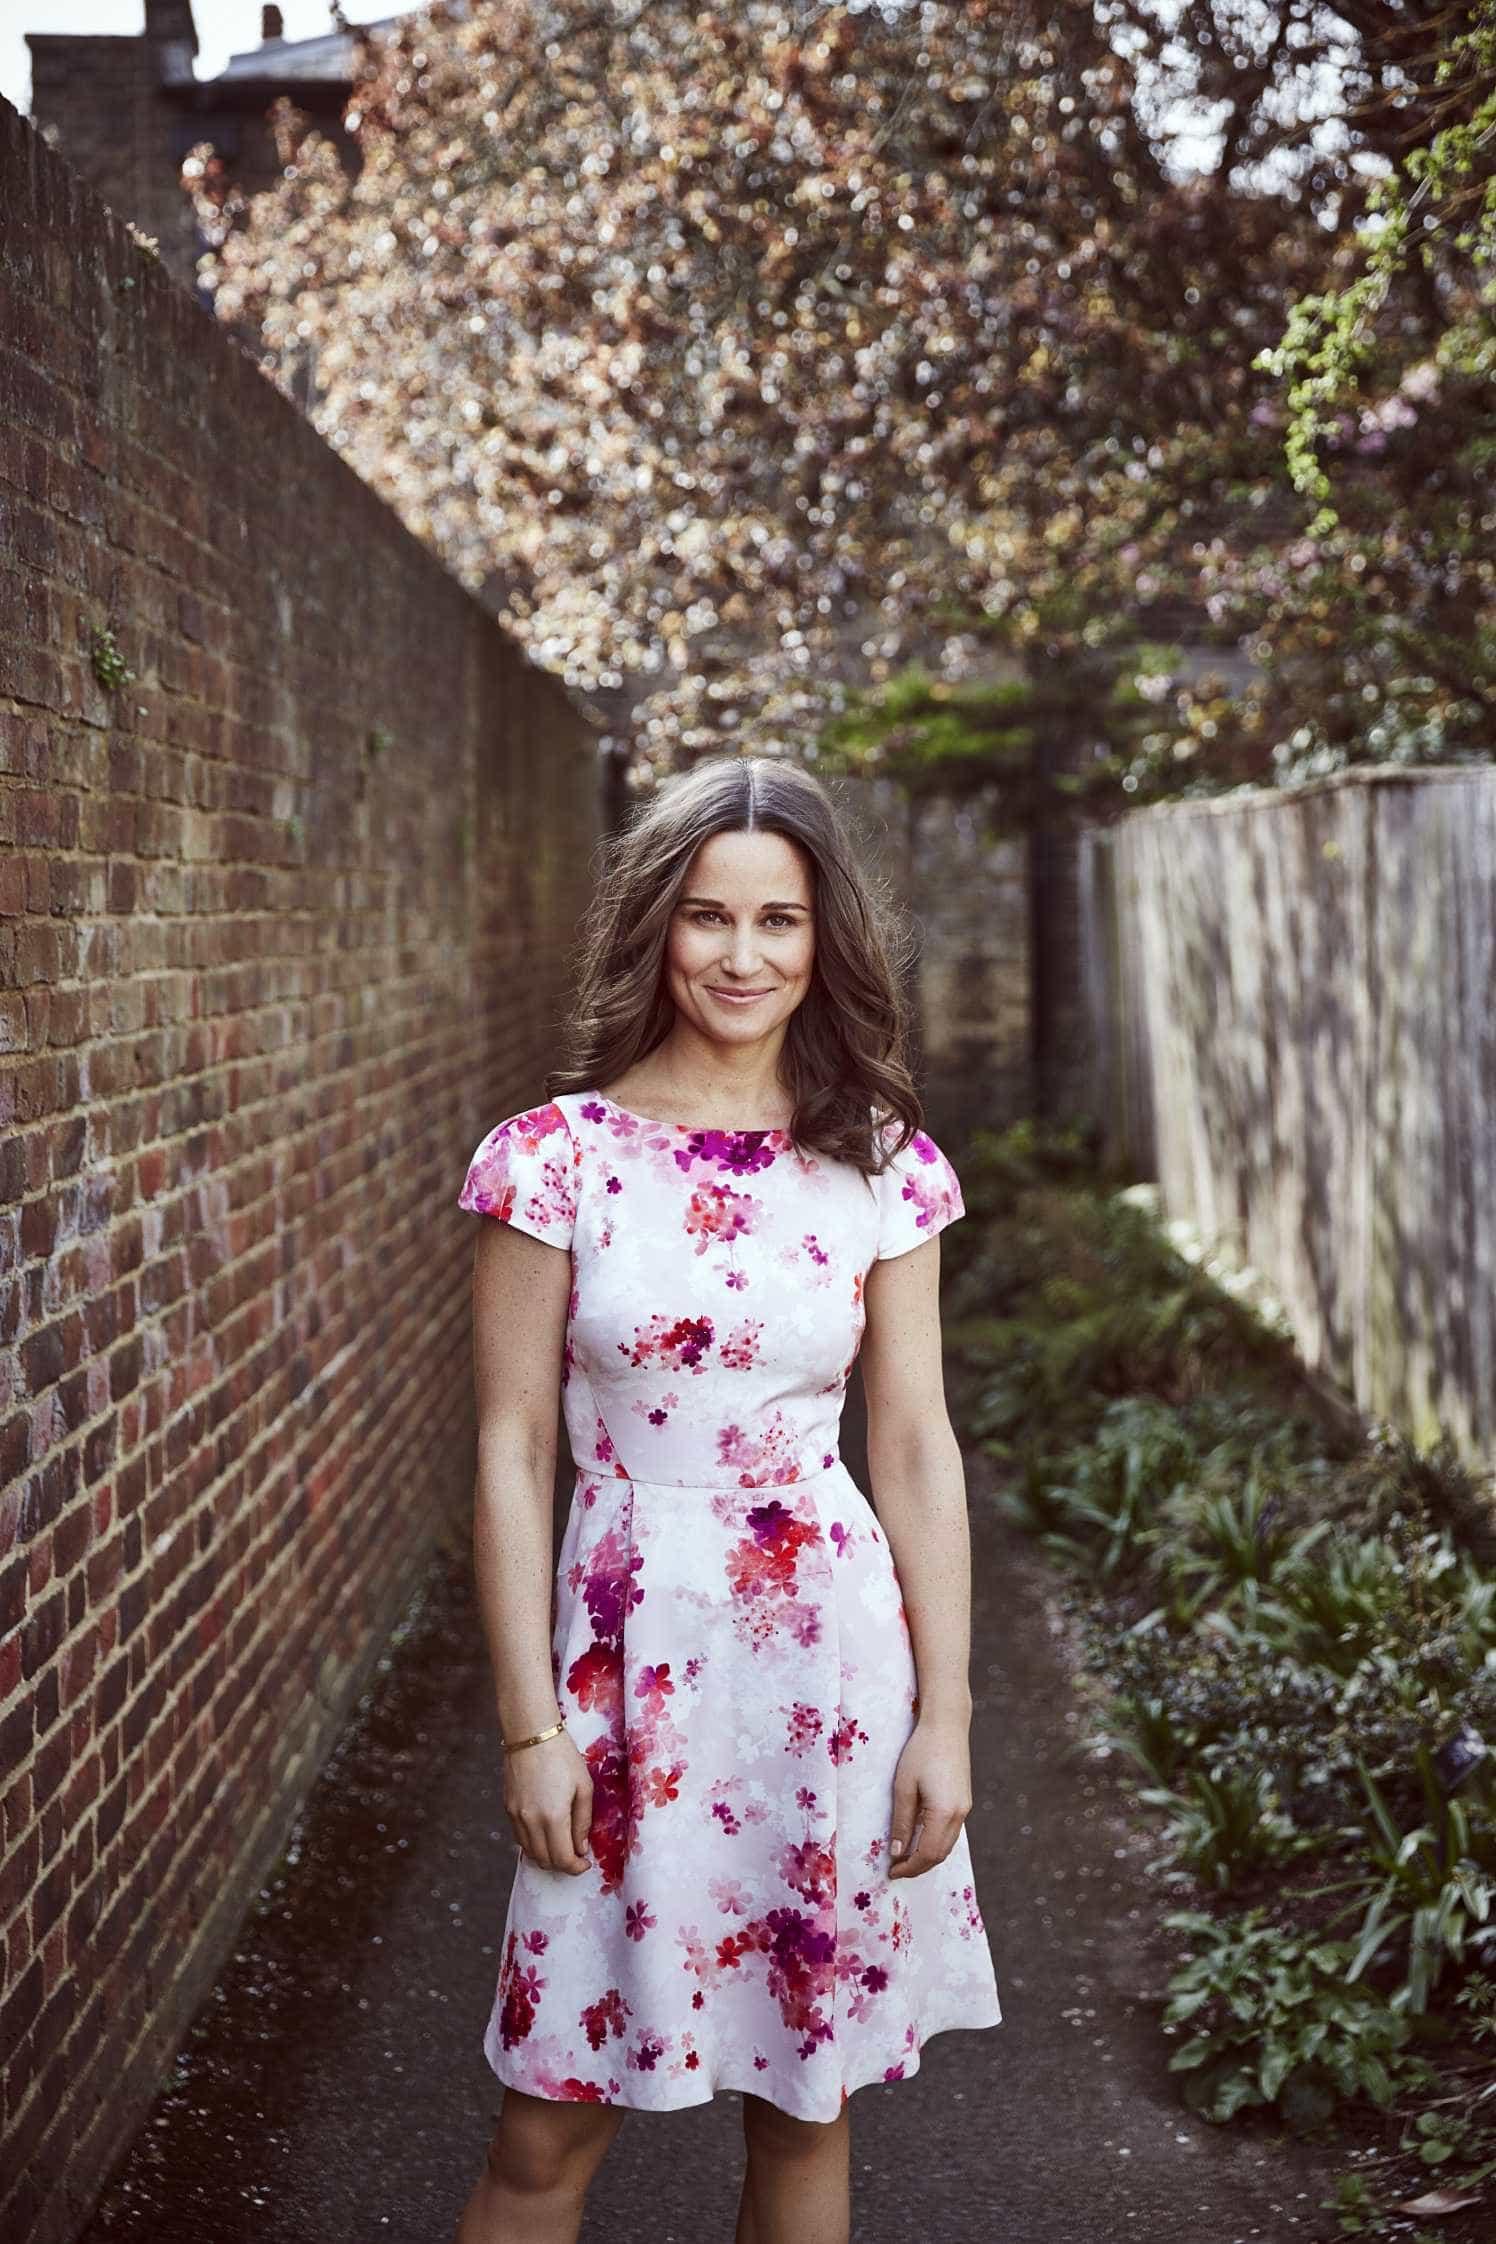 Pippa Middleton exibe boa forma física dois meses após ser mãe